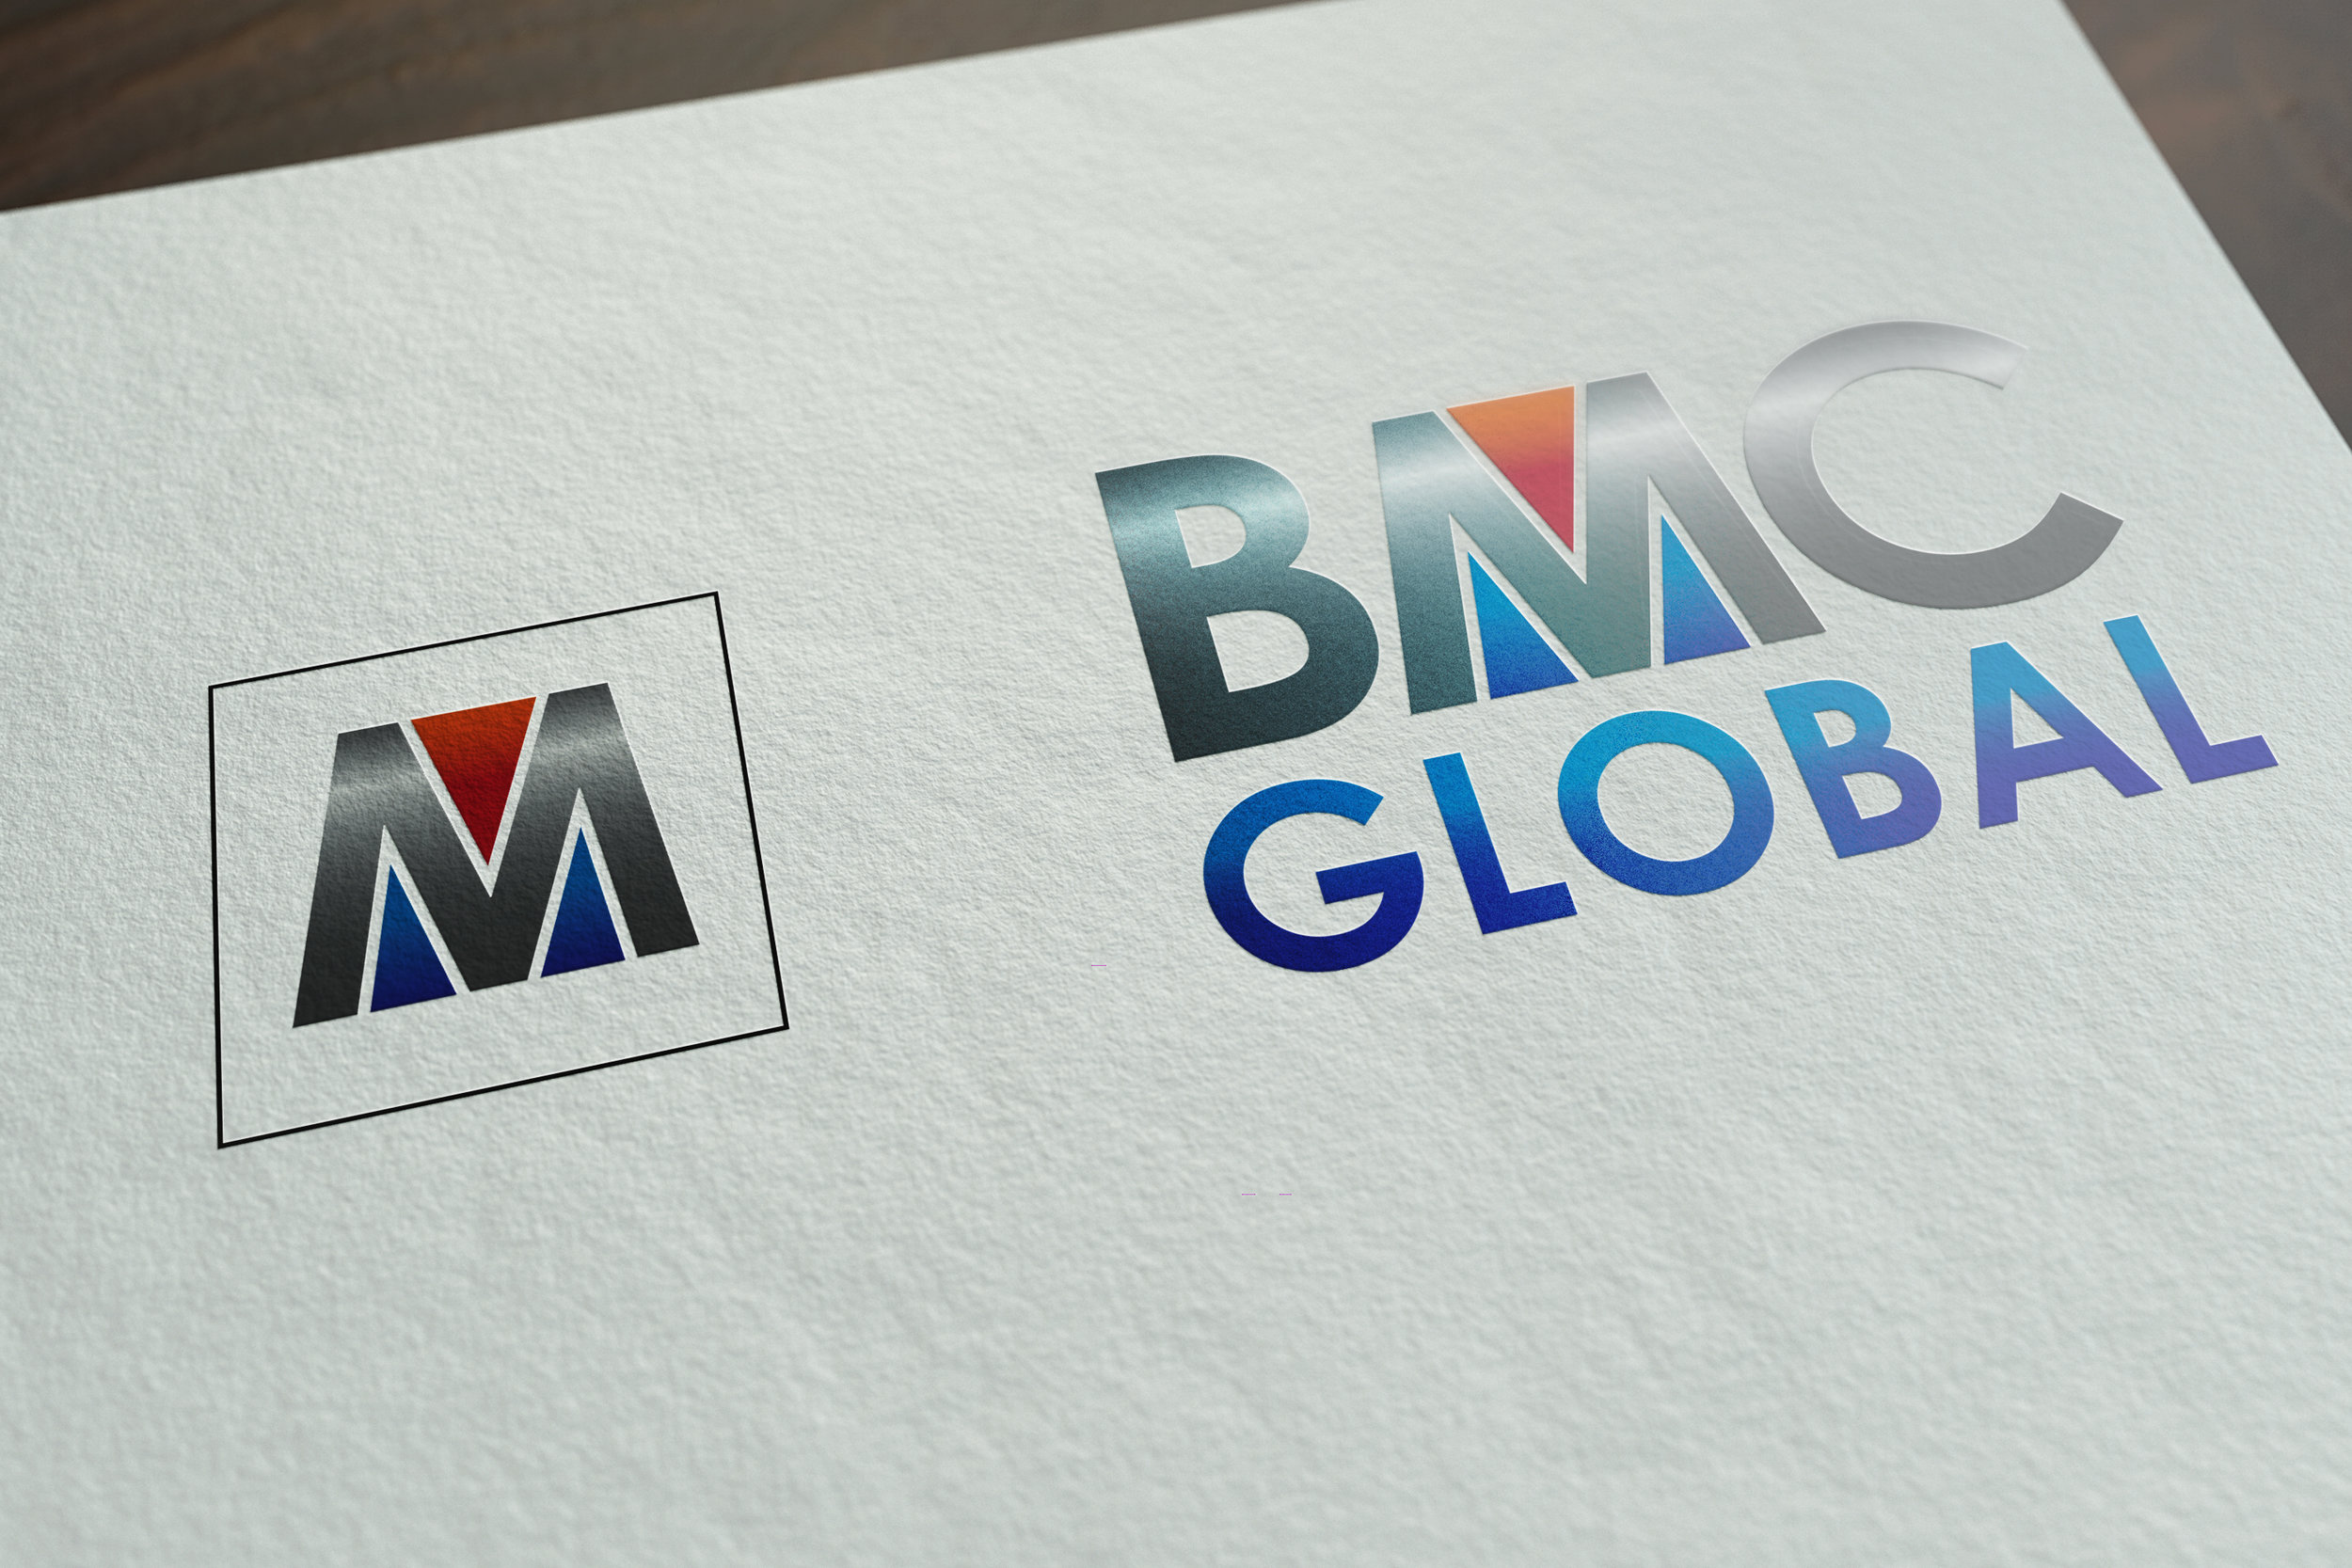 BMC-5.jpg